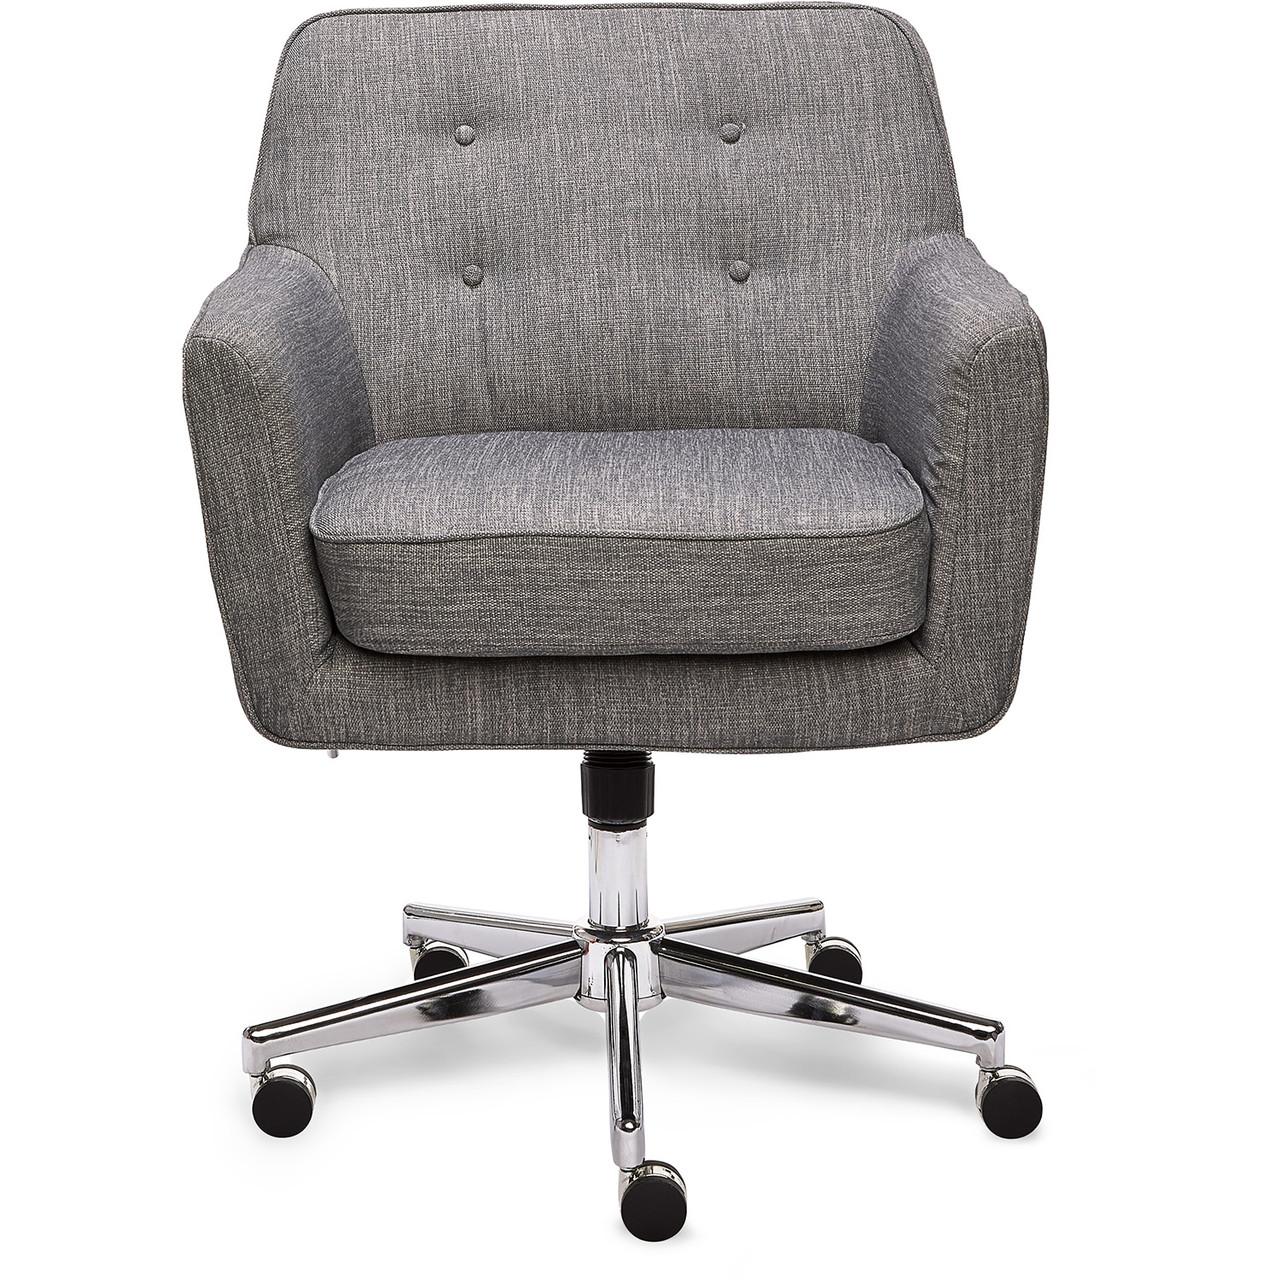 Serta Style Ashland Home Office Chair Gray Twill Fabric Clickdecor